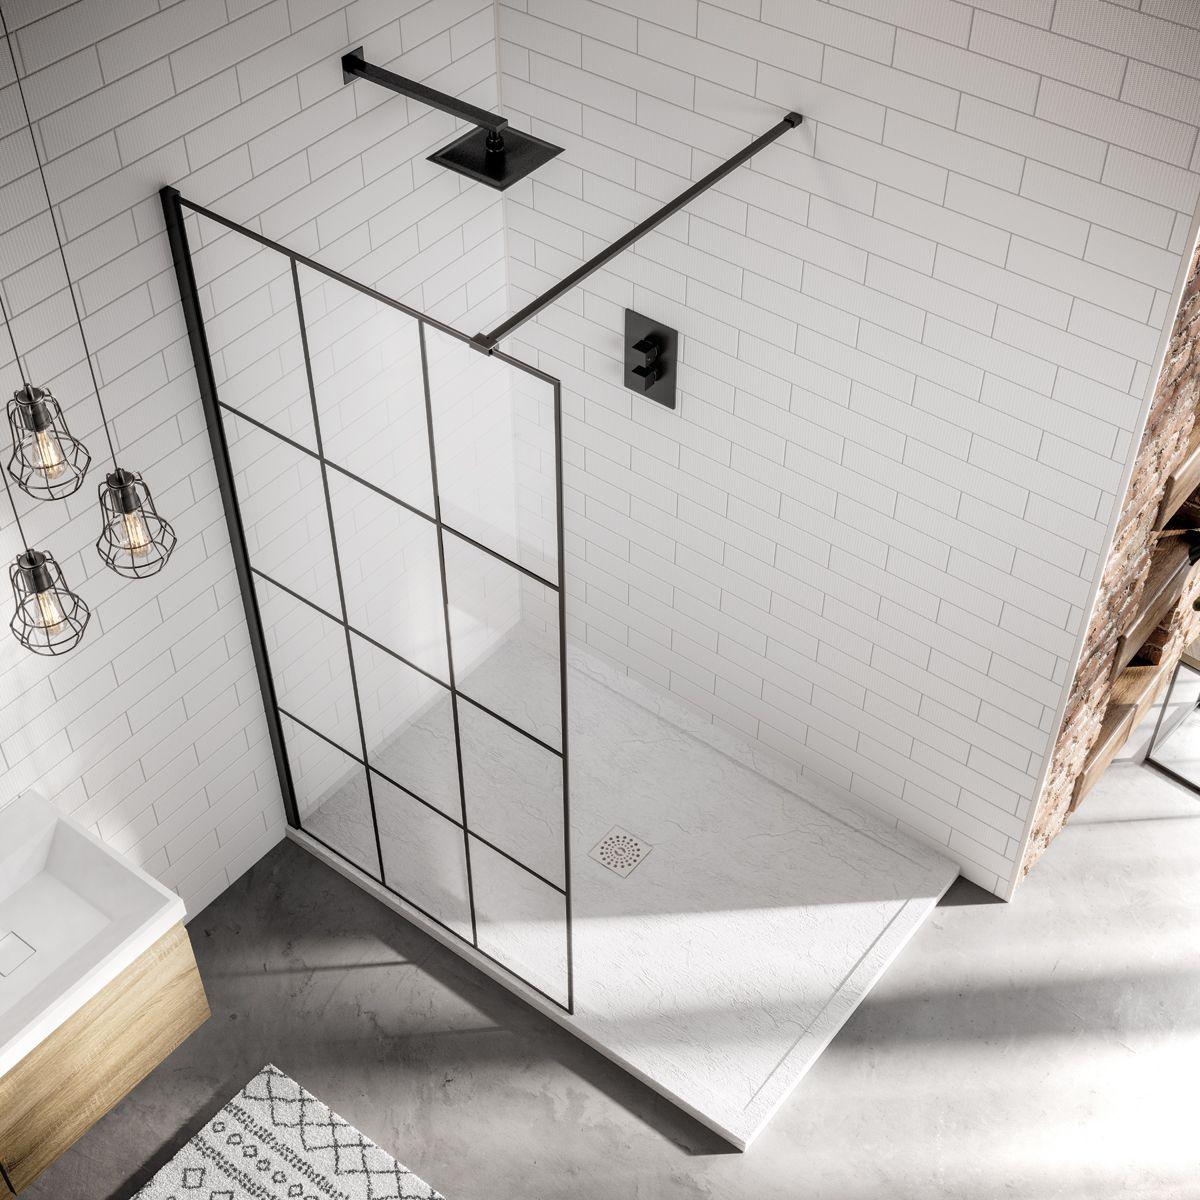 April Identiti black frame shower screen from above